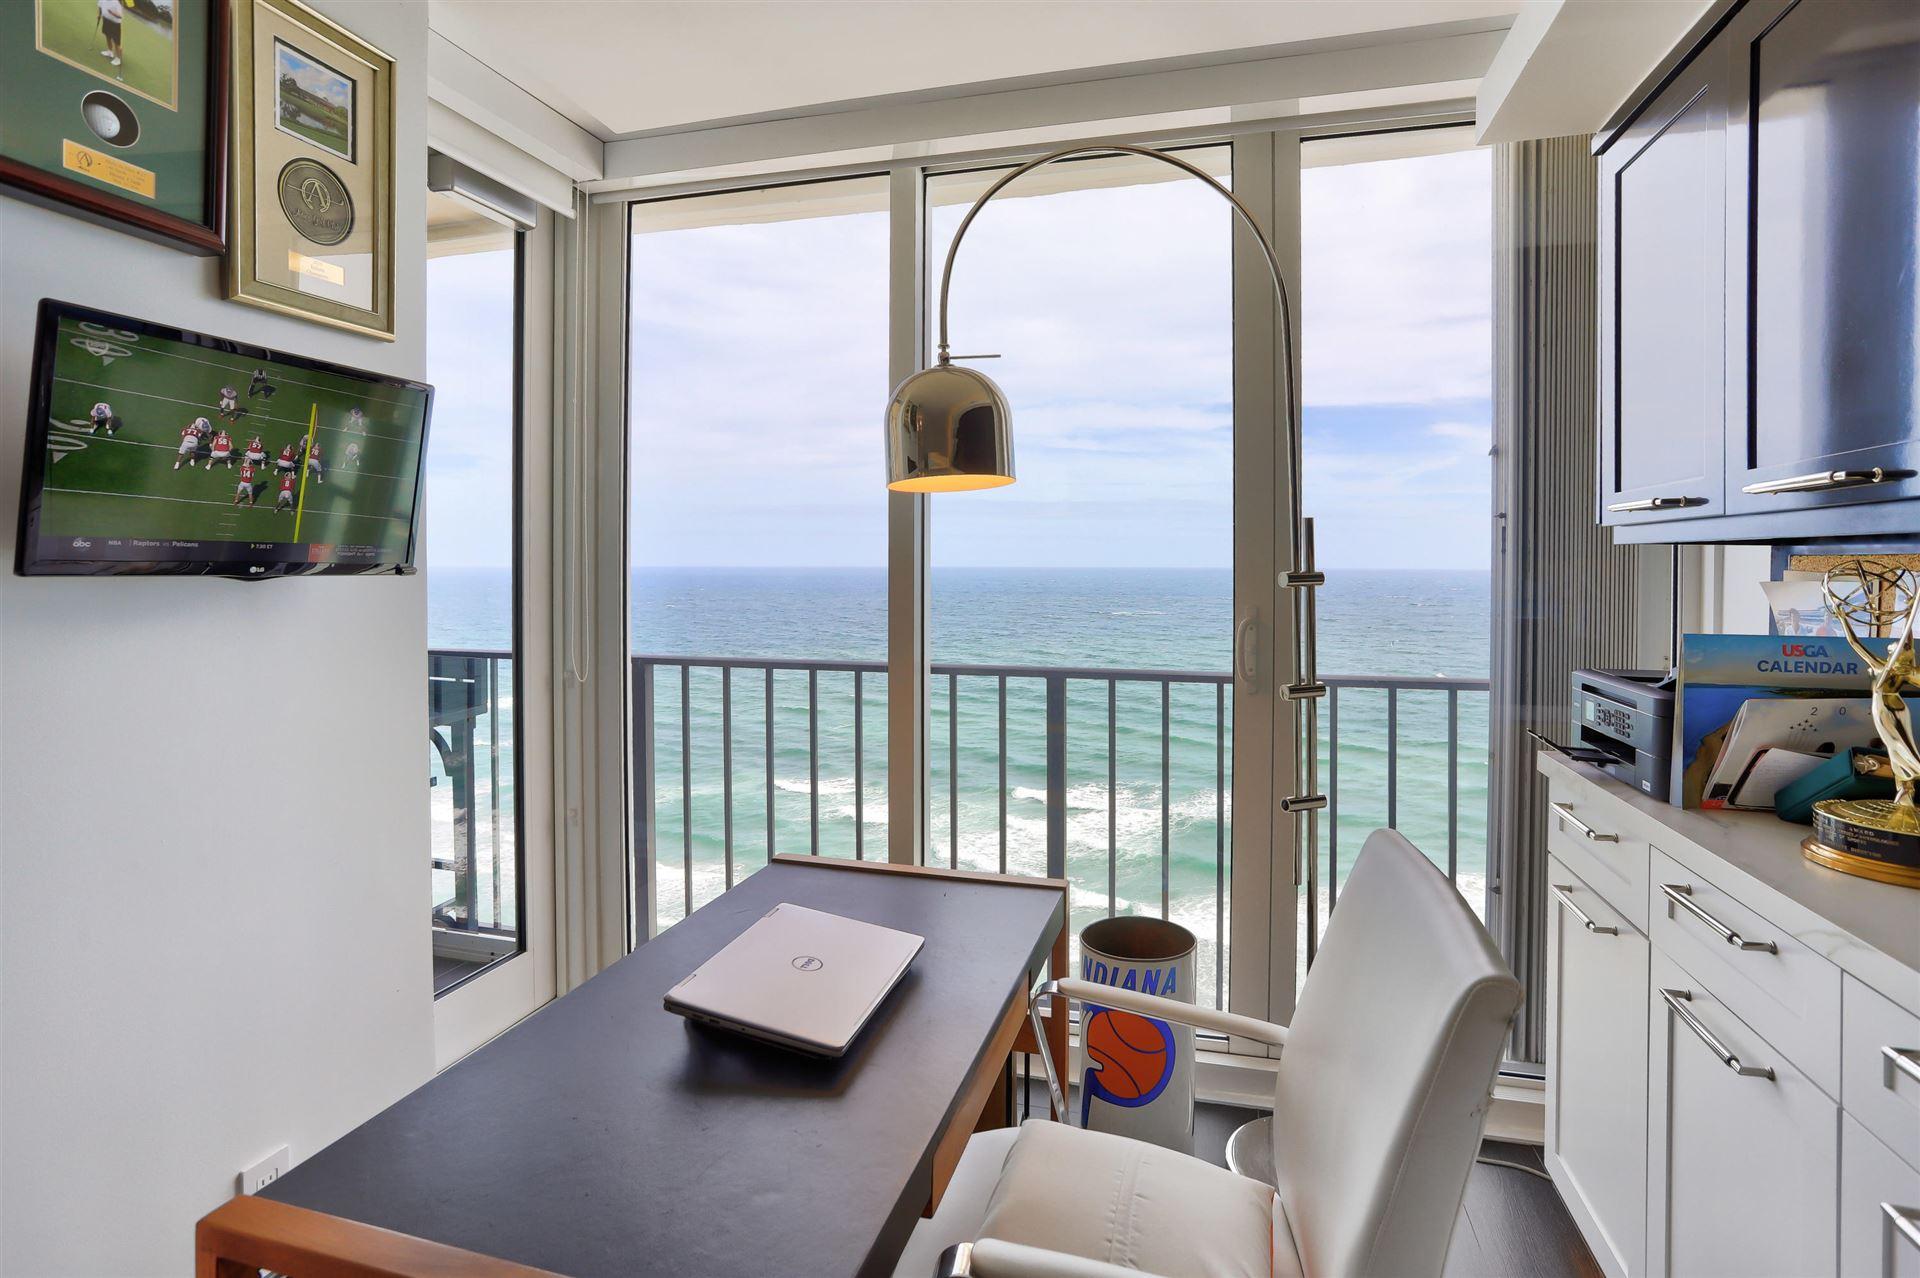 2800 S Ocean Blvd #21-J, Boca Raton, FL 33432 - #: RX-10678810